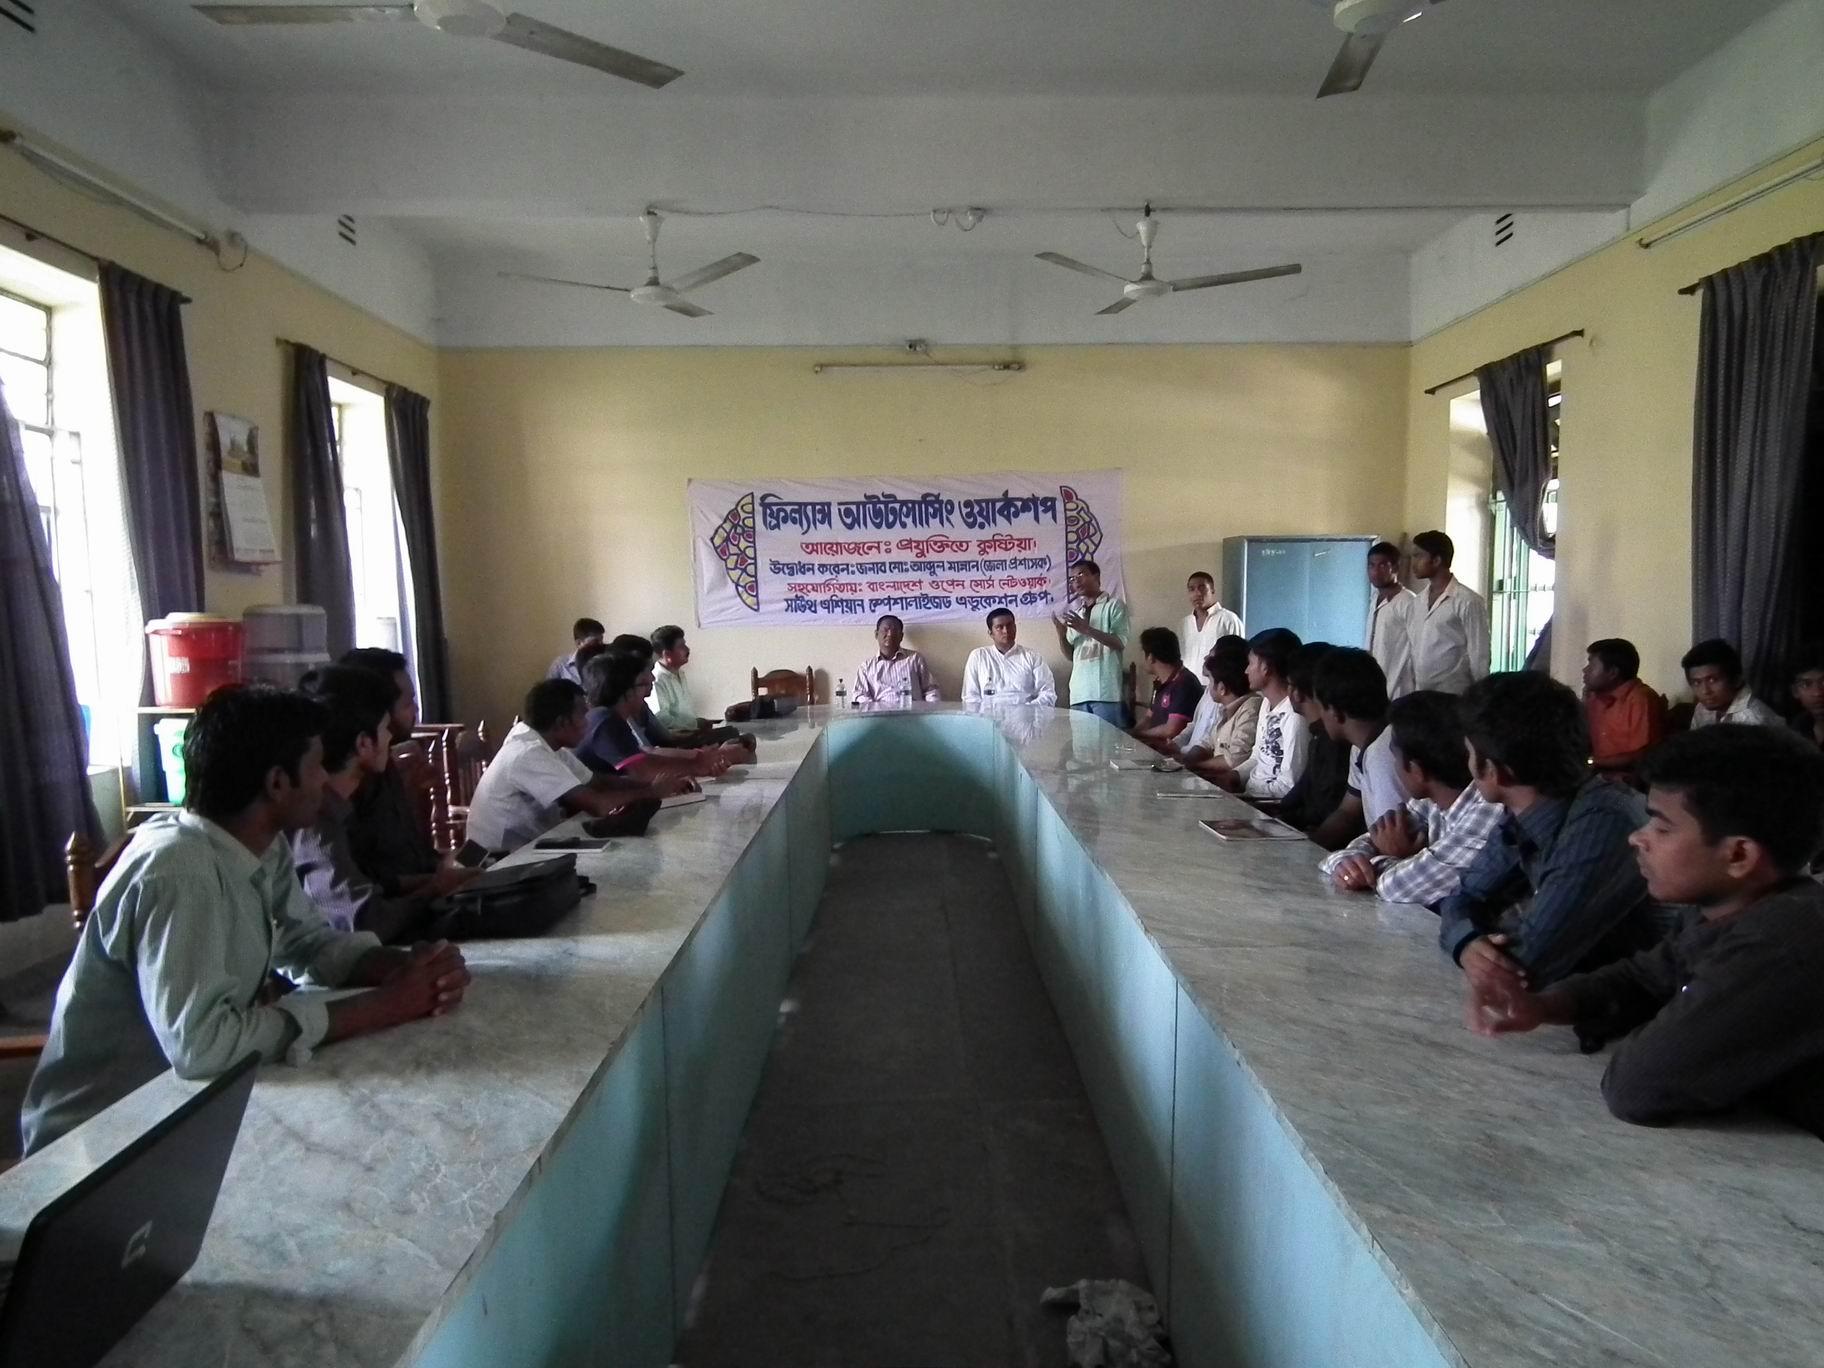 Freelance Outsourcing Workshop, Kushtia (ফ্রিল্যান্স আউটসোর্সিং কর্মশালা, কুষ্টিয়া) #ProjuktiteKushtia #ProjuktiteBangladesh #FreelanceOutsourcing